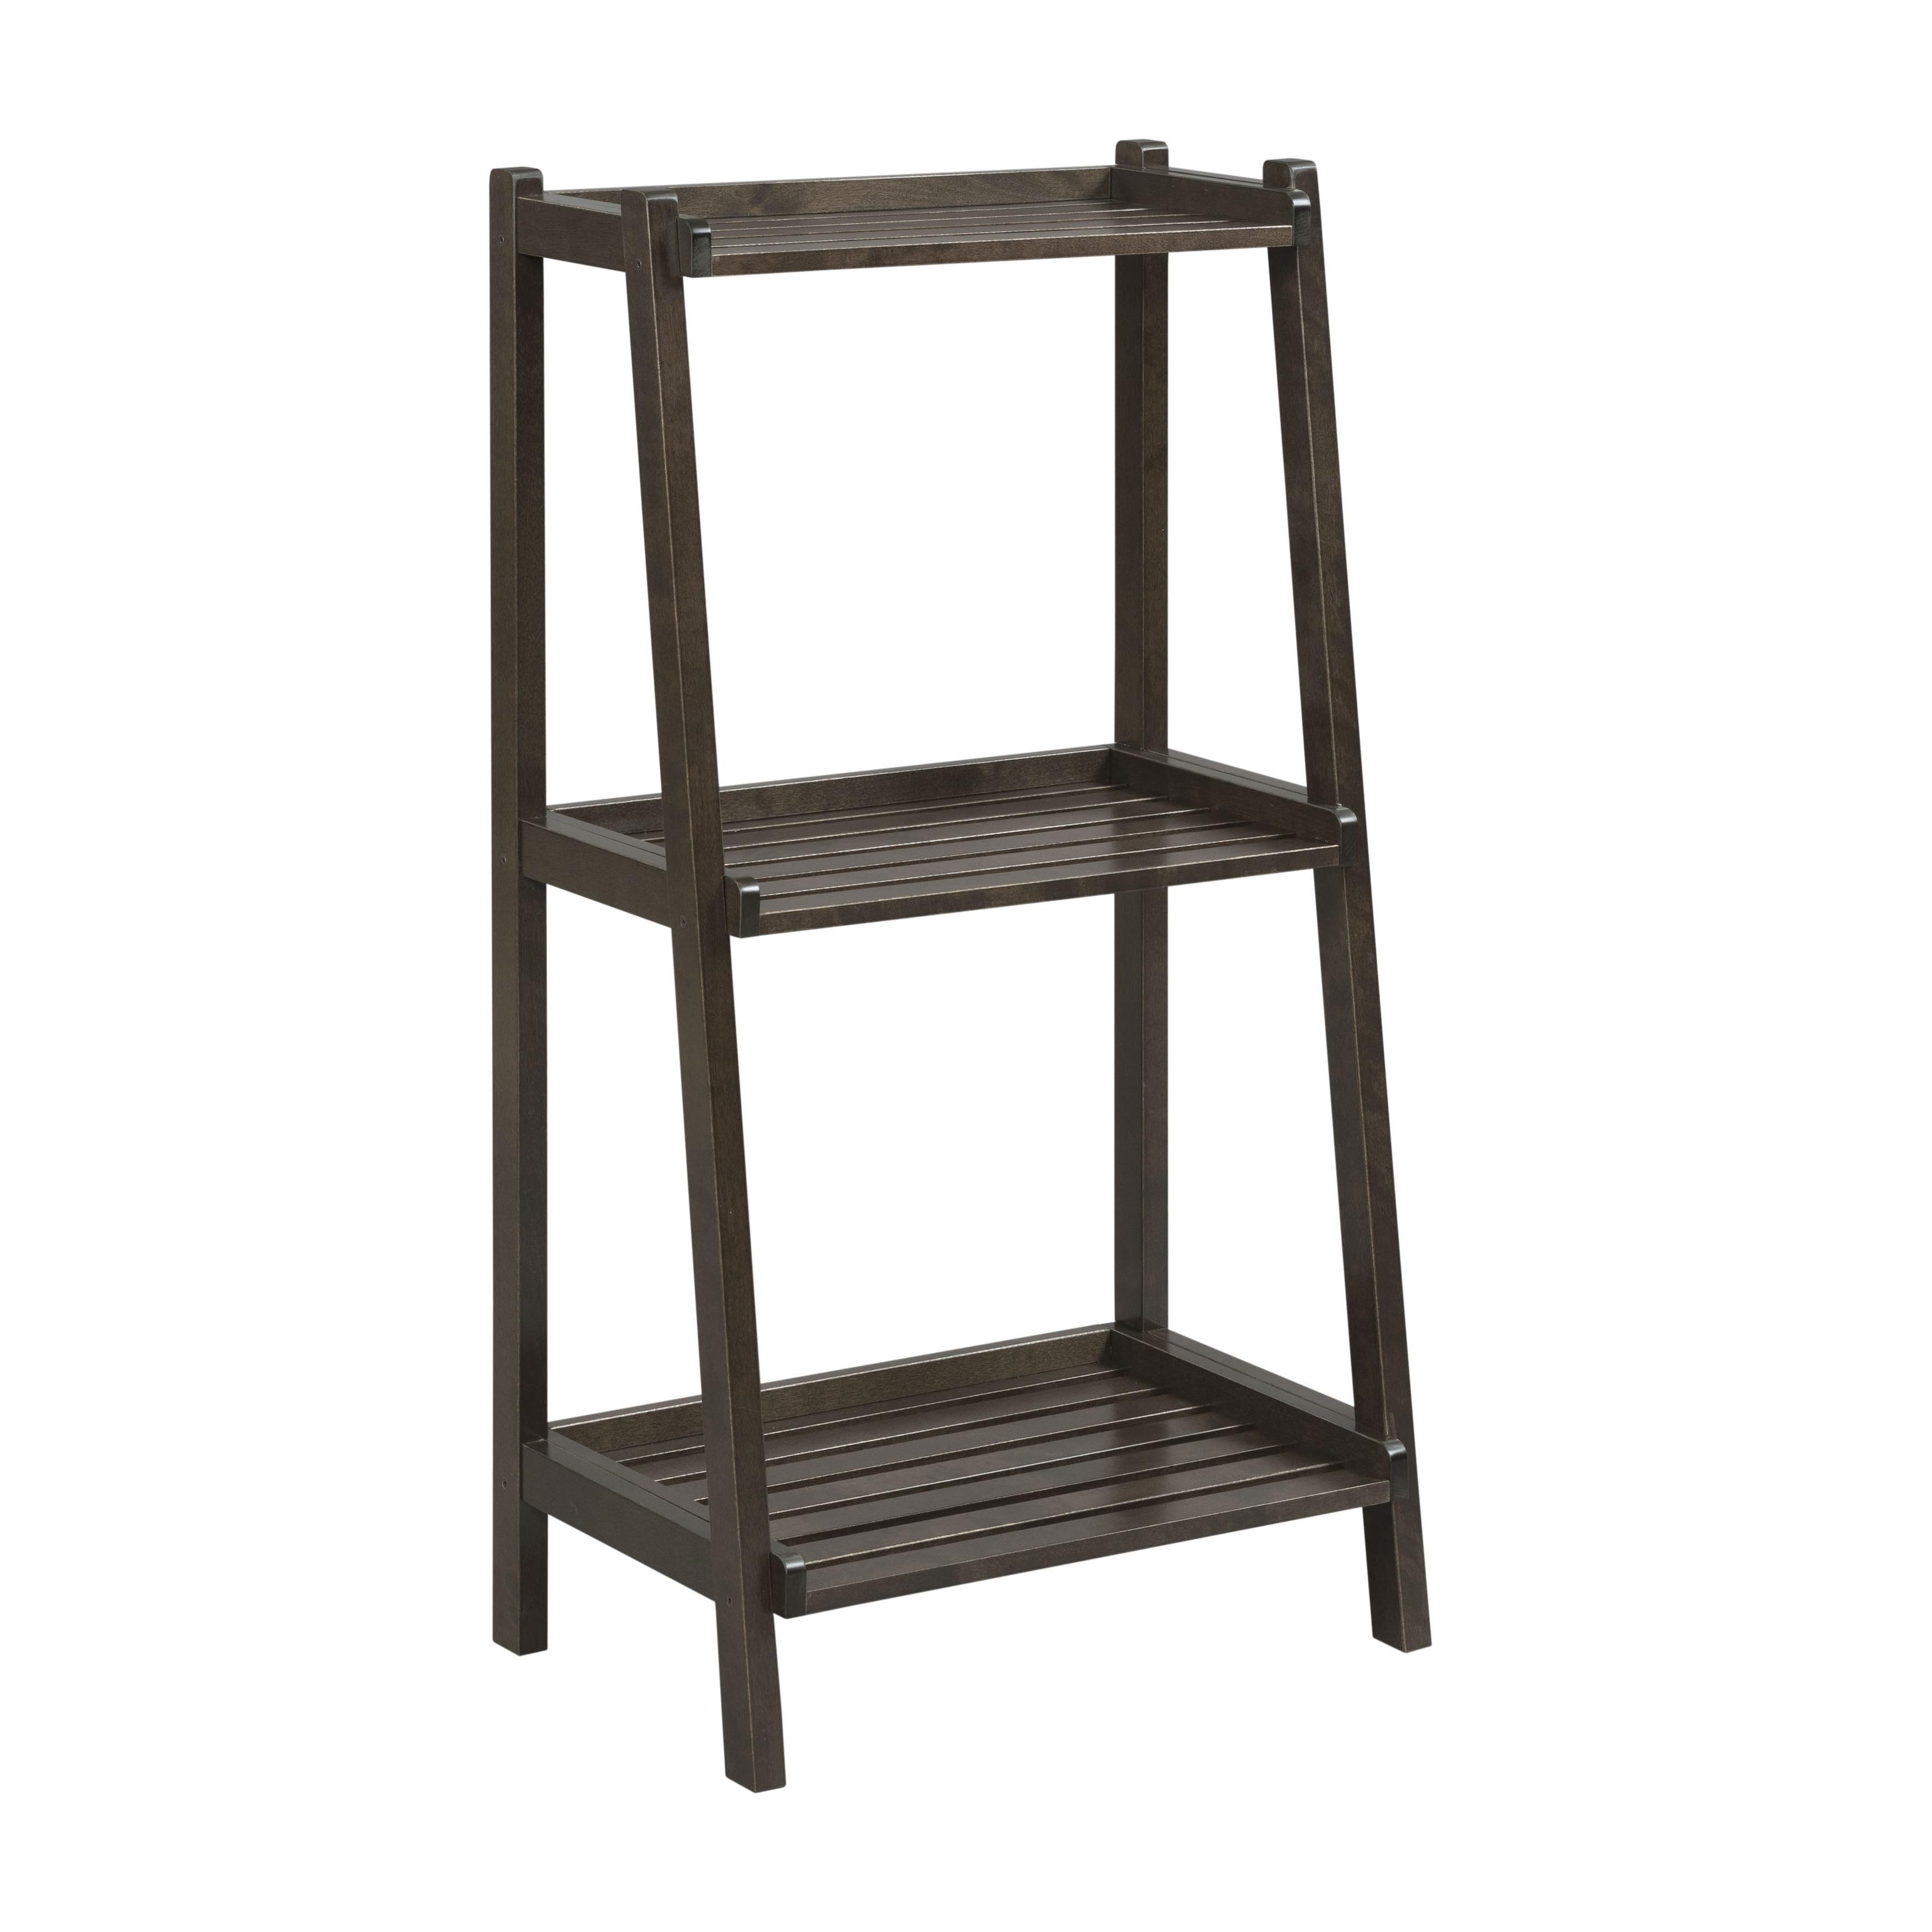 Shop NewRidge Home Solid Wood Dunnsville 3 Tier Ladder Shelf Bookcase